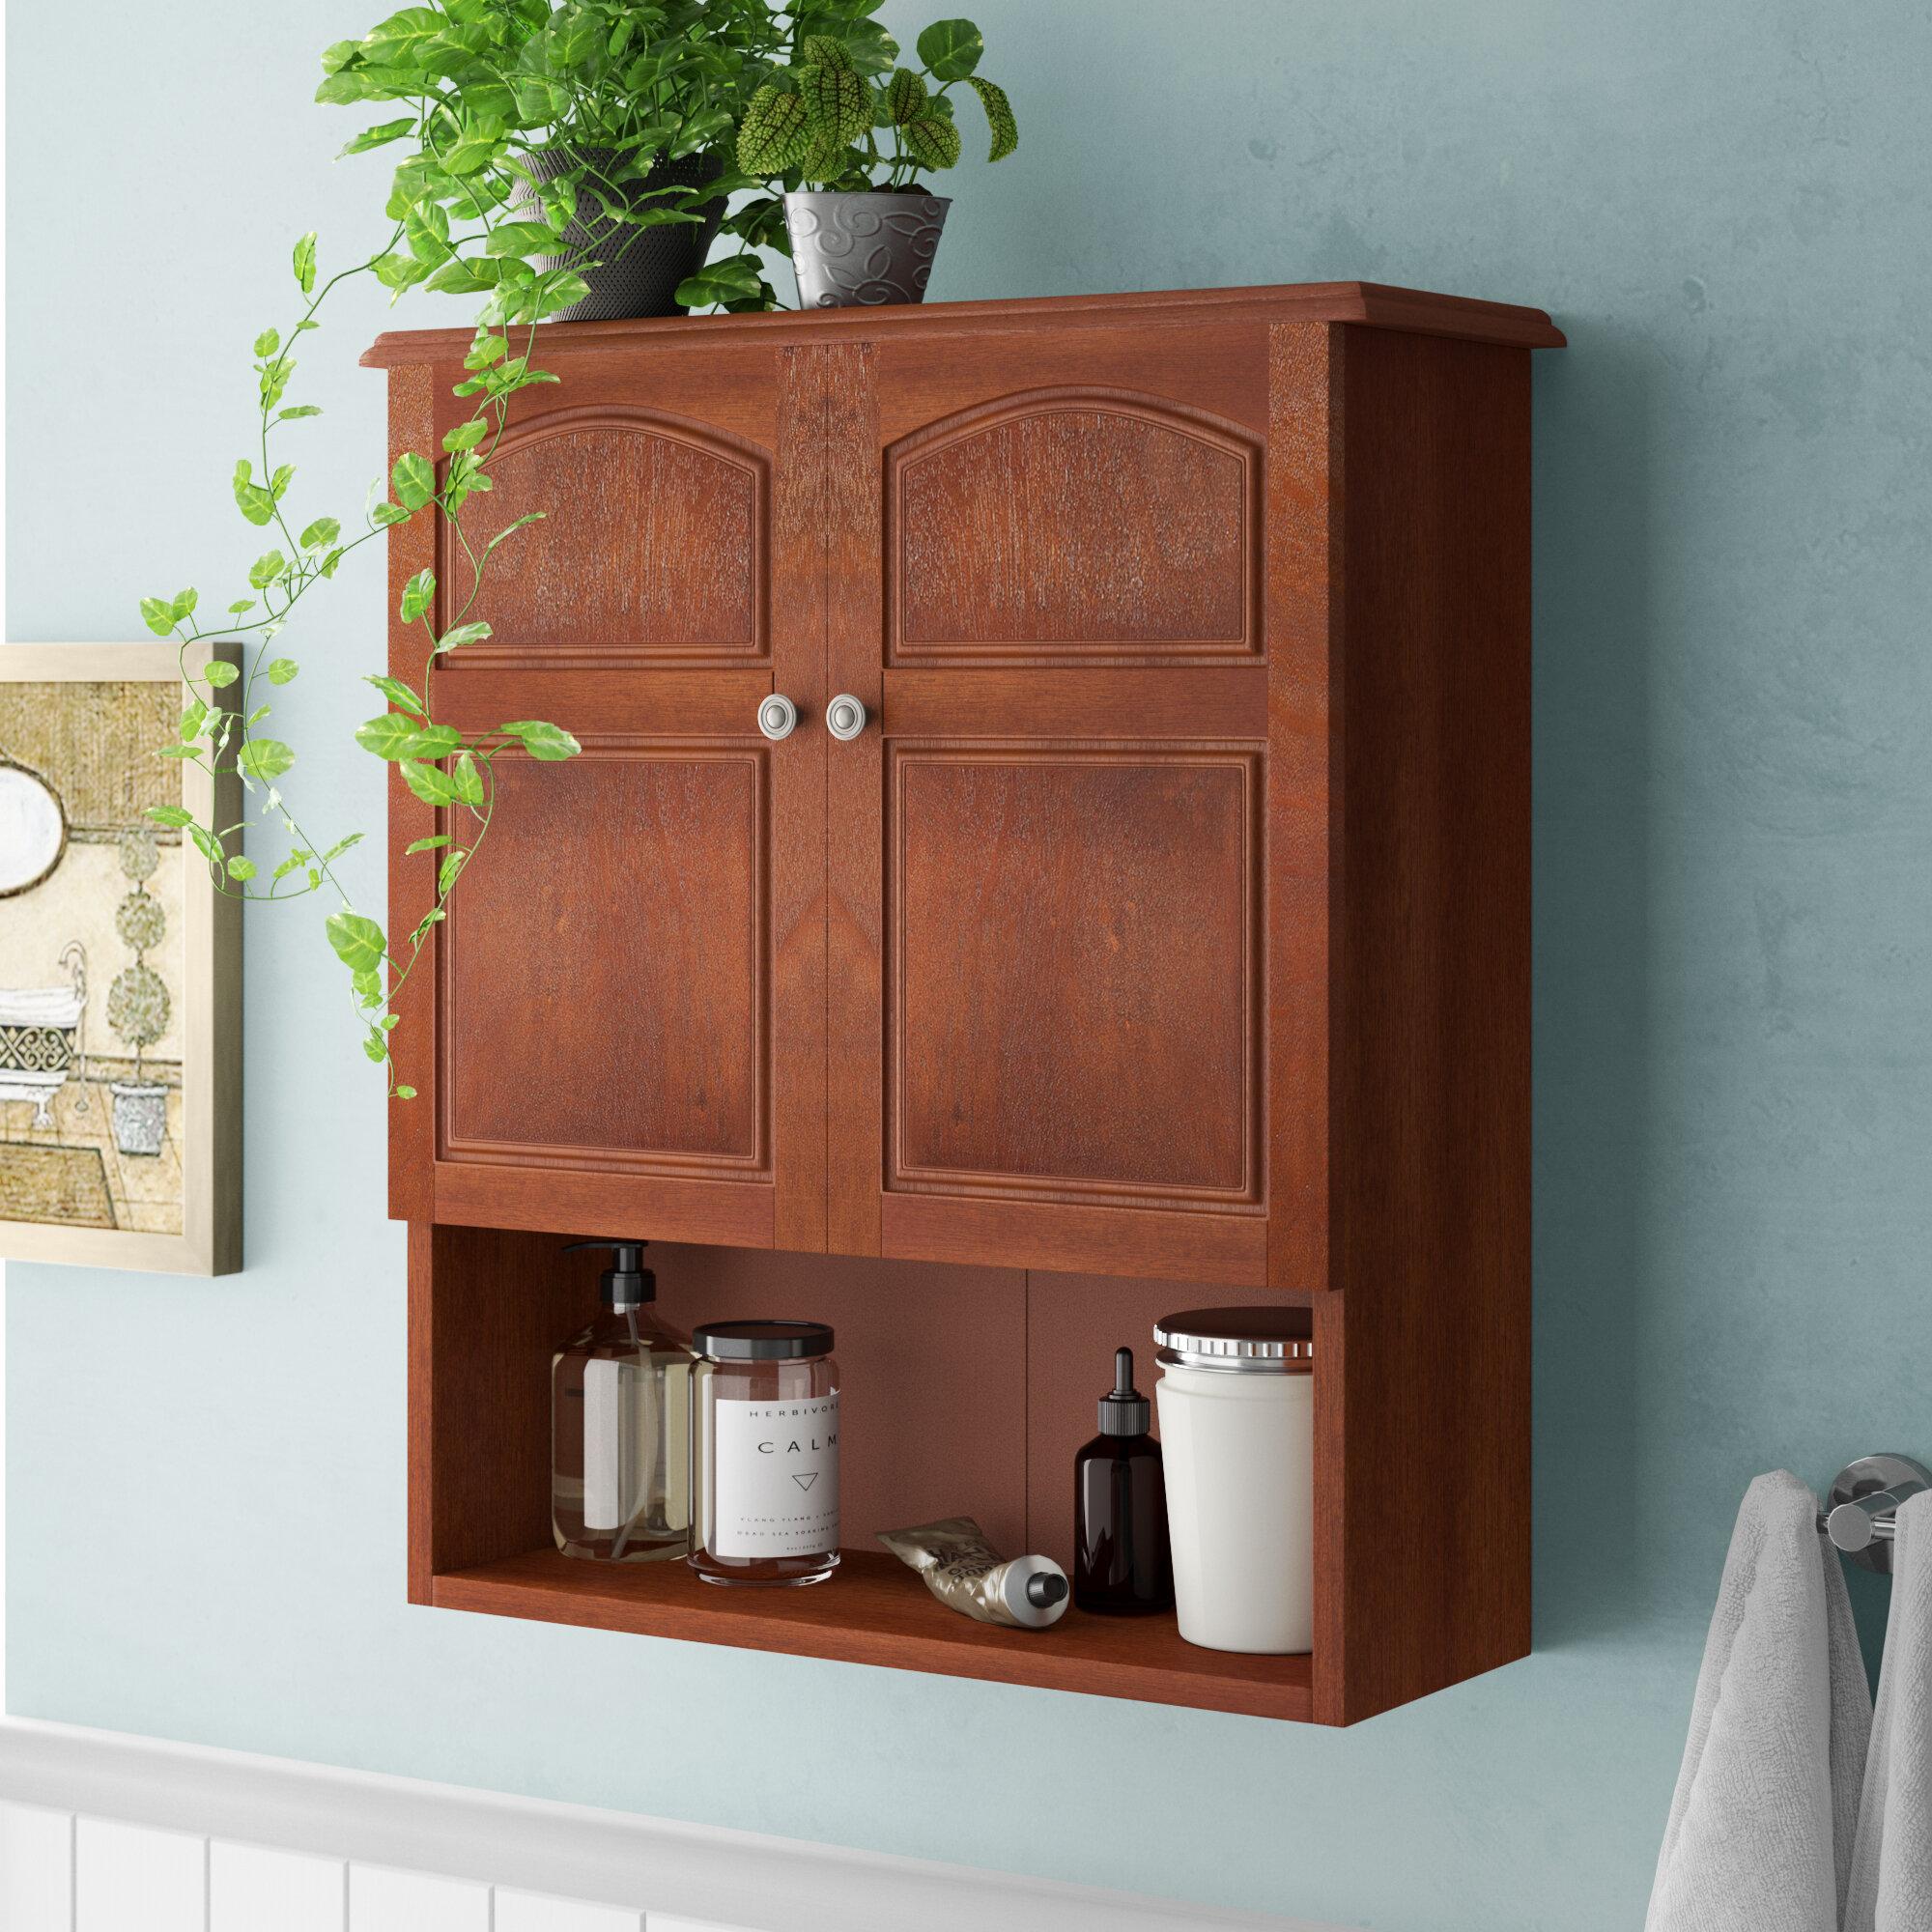 Charlton Home Brogden 22 25 W X 25 H X 6 D Wall Mounted Bathroom Cabinet Reviews Wayfair